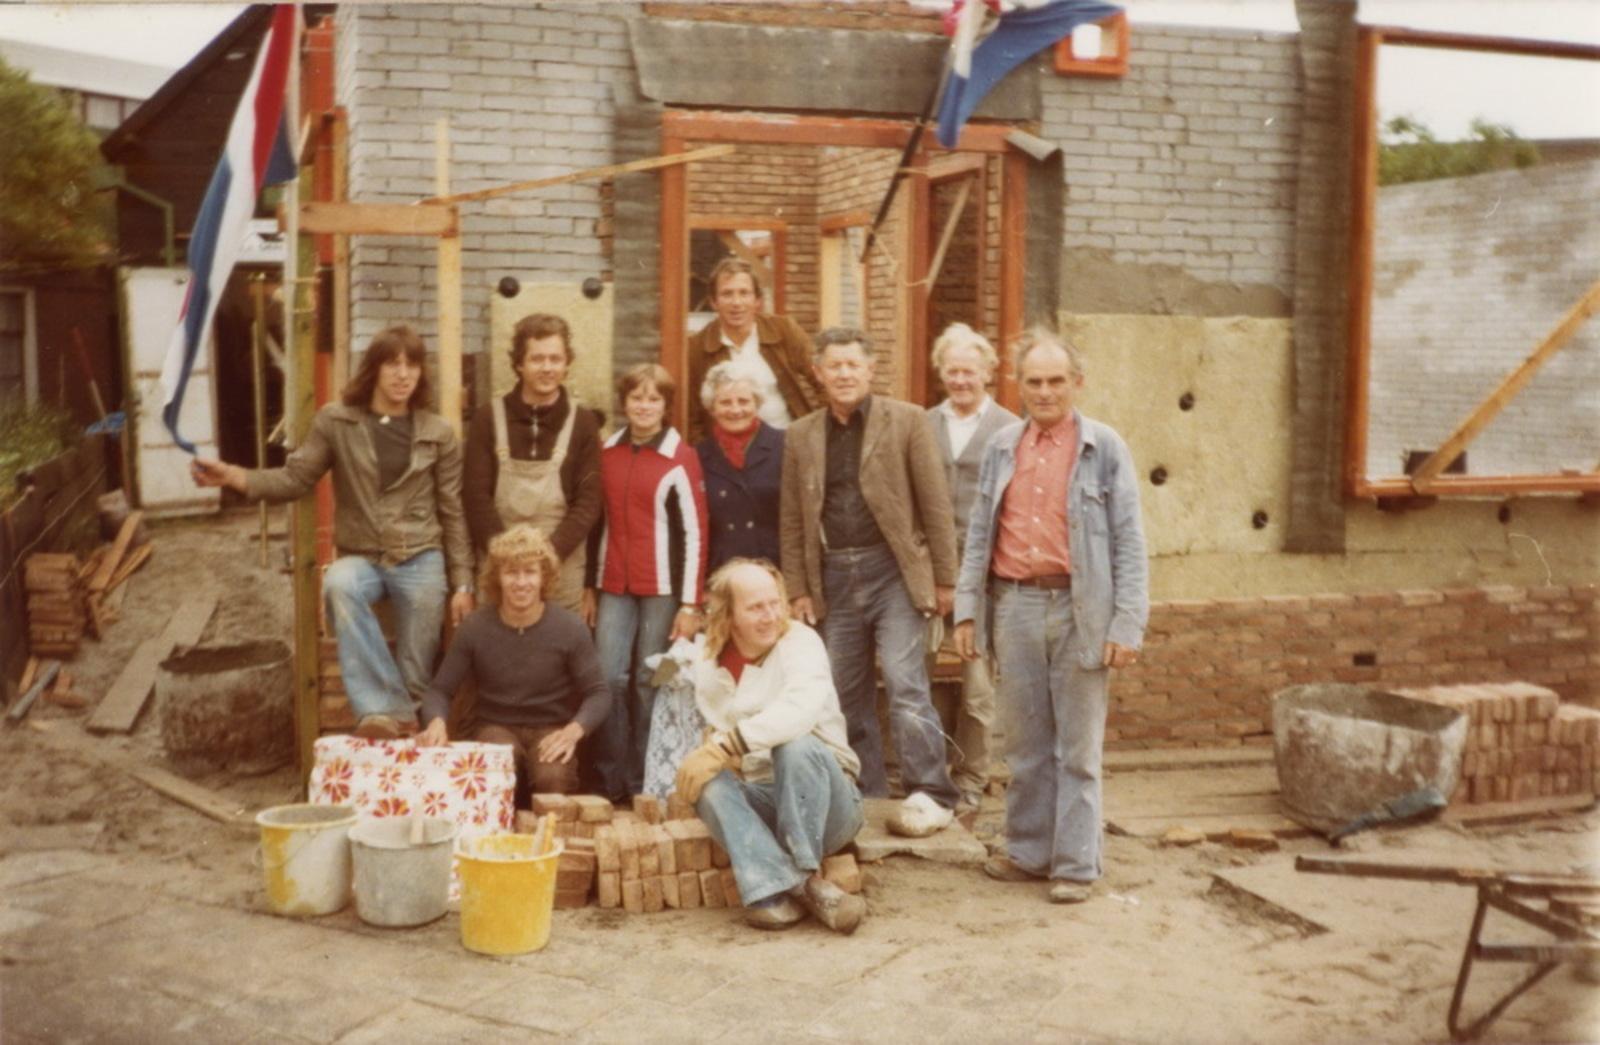 Marktplein N 0037 1978 Nieuwbouw huize aannemer den Ouden 07